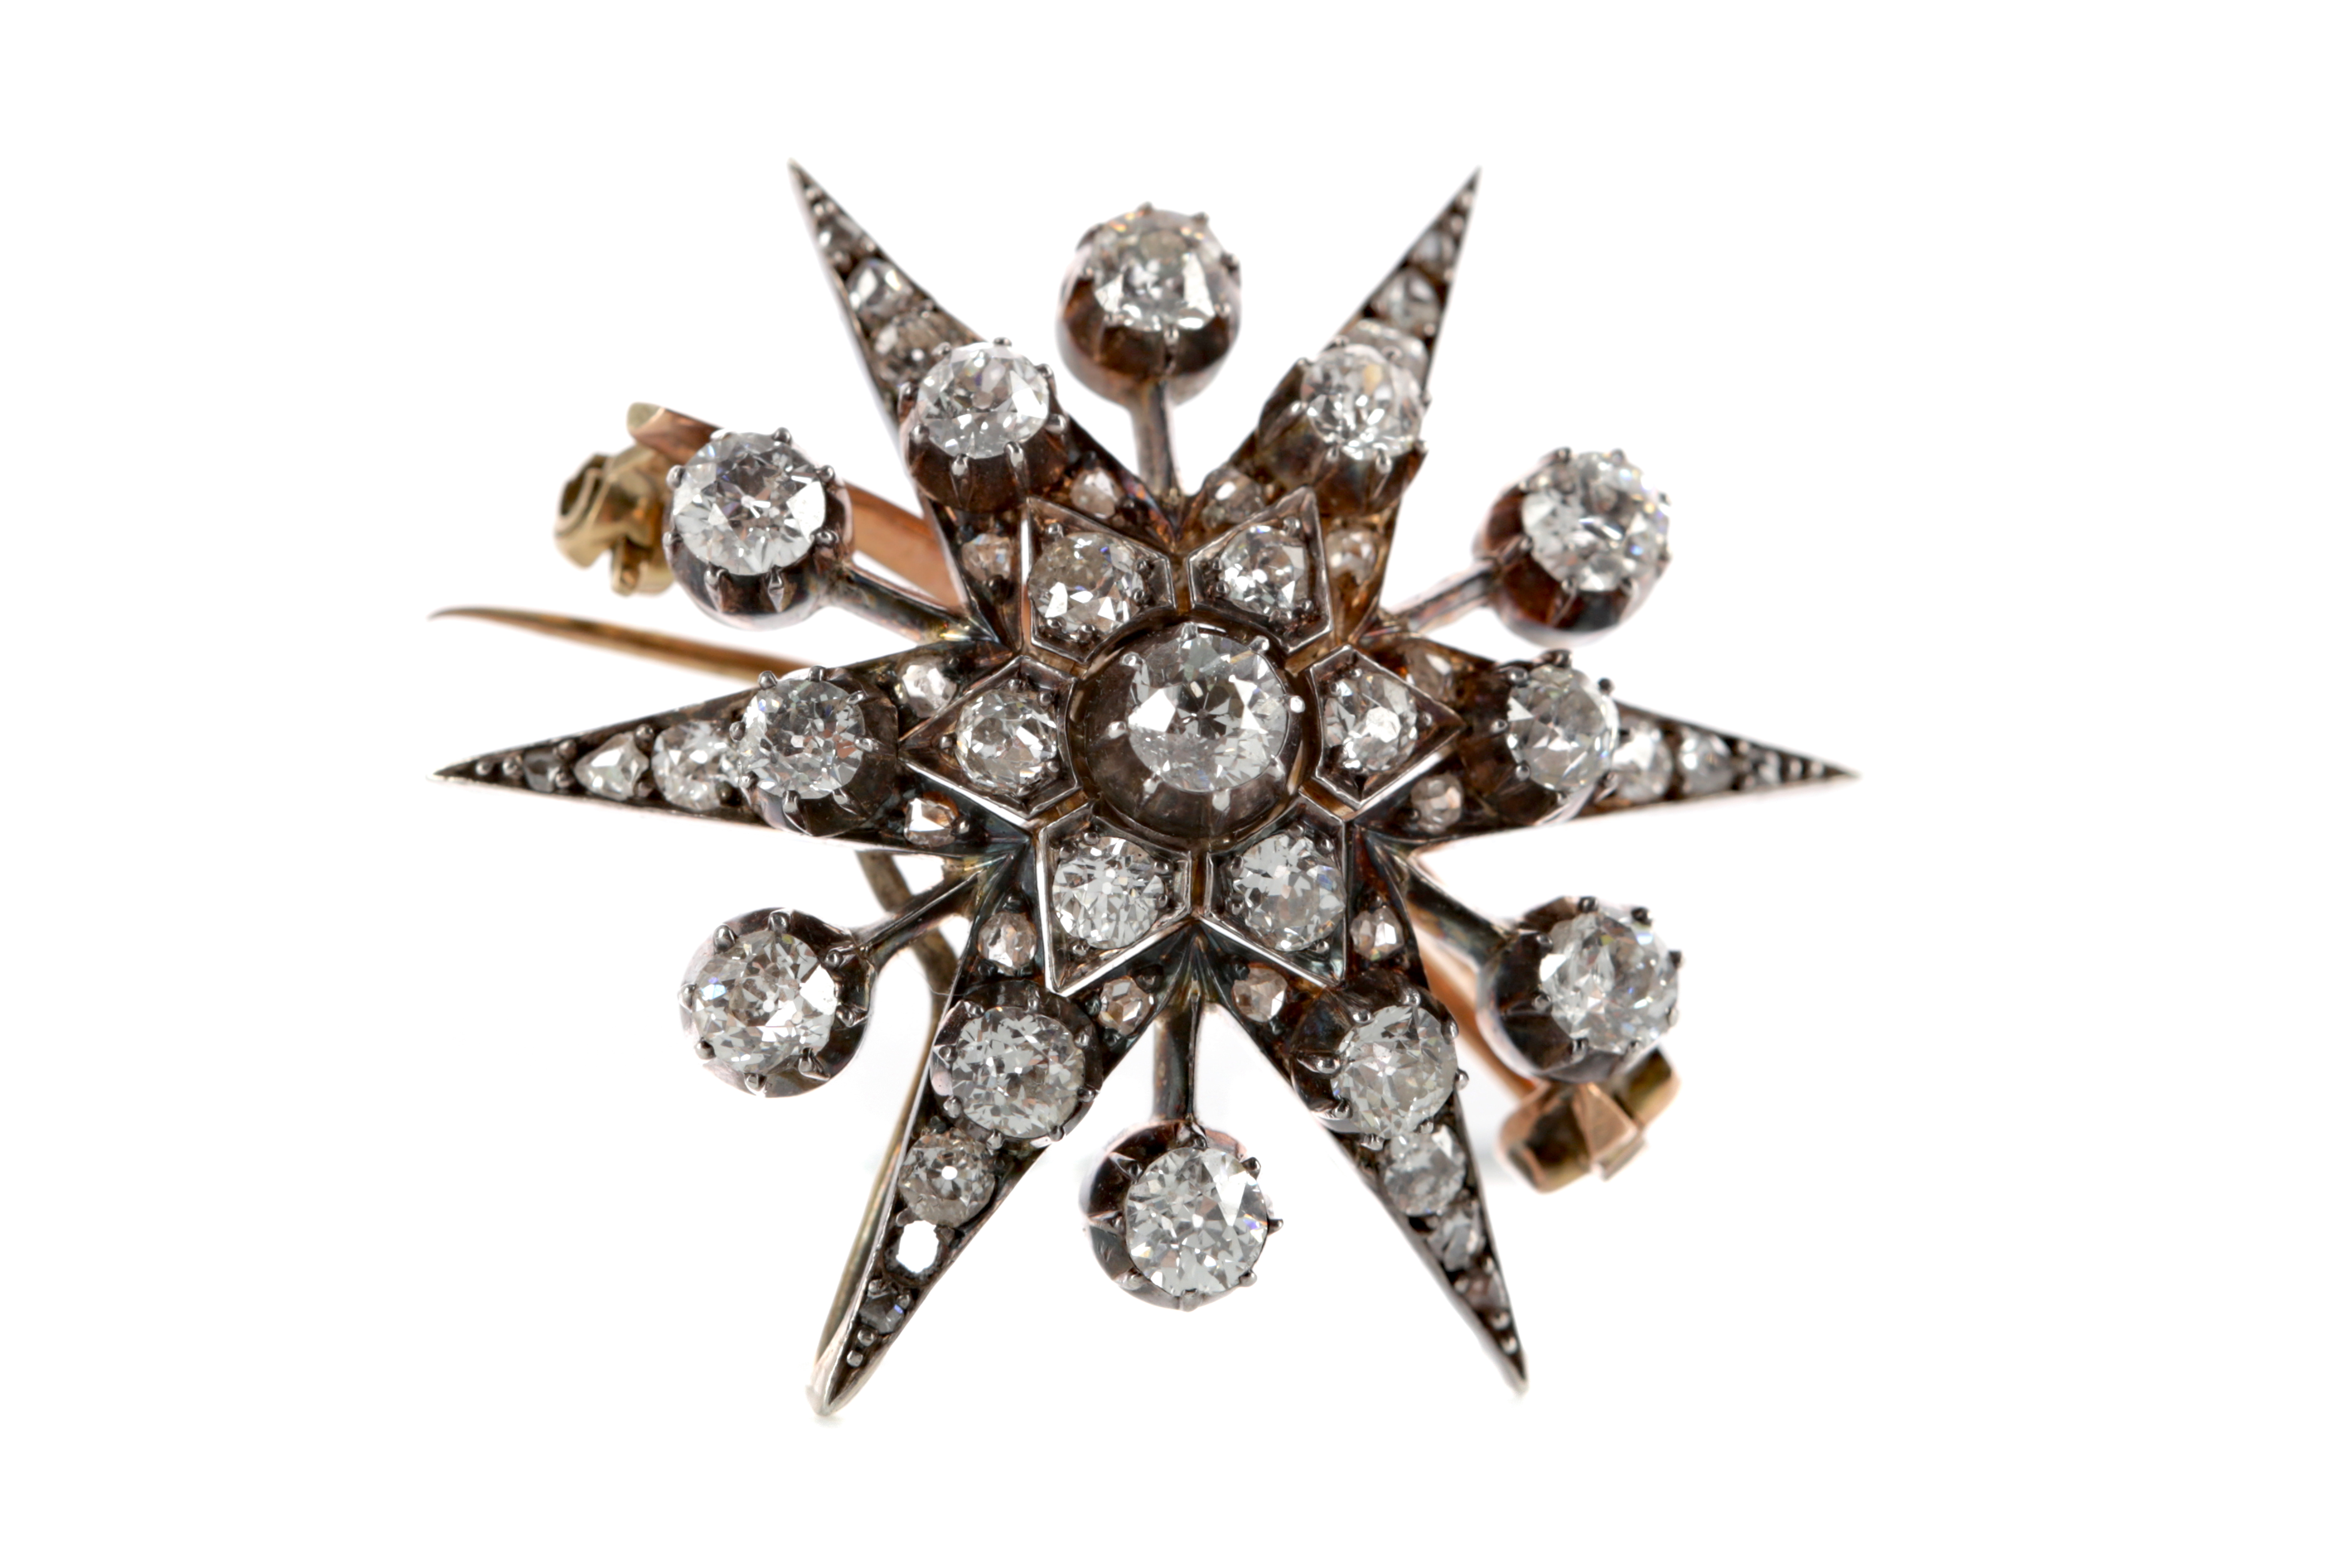 A DIAMOND SET STAR BROOCH